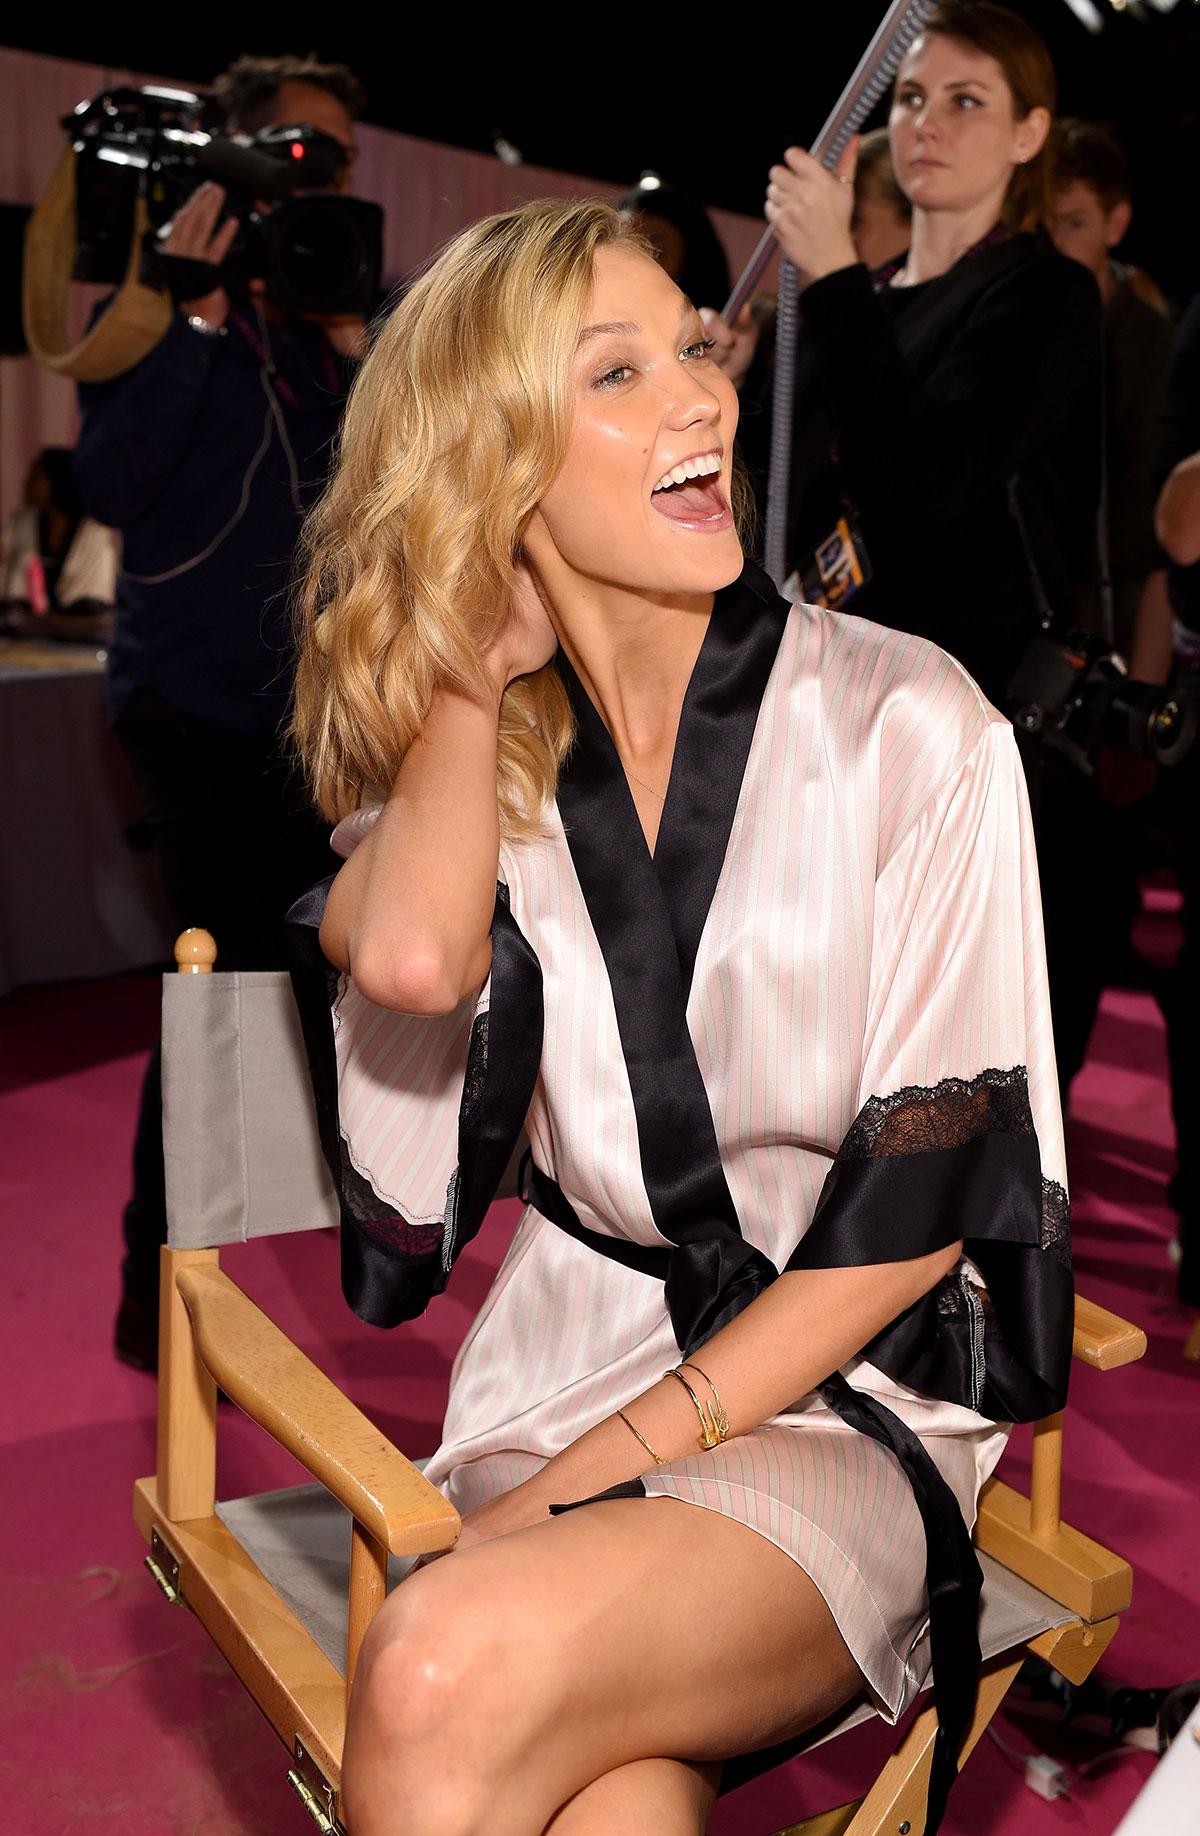 e3256f1c9f1 KARLIE KLOSS on the Backstage of 2014 Victoria s Secret Fashion Show ...